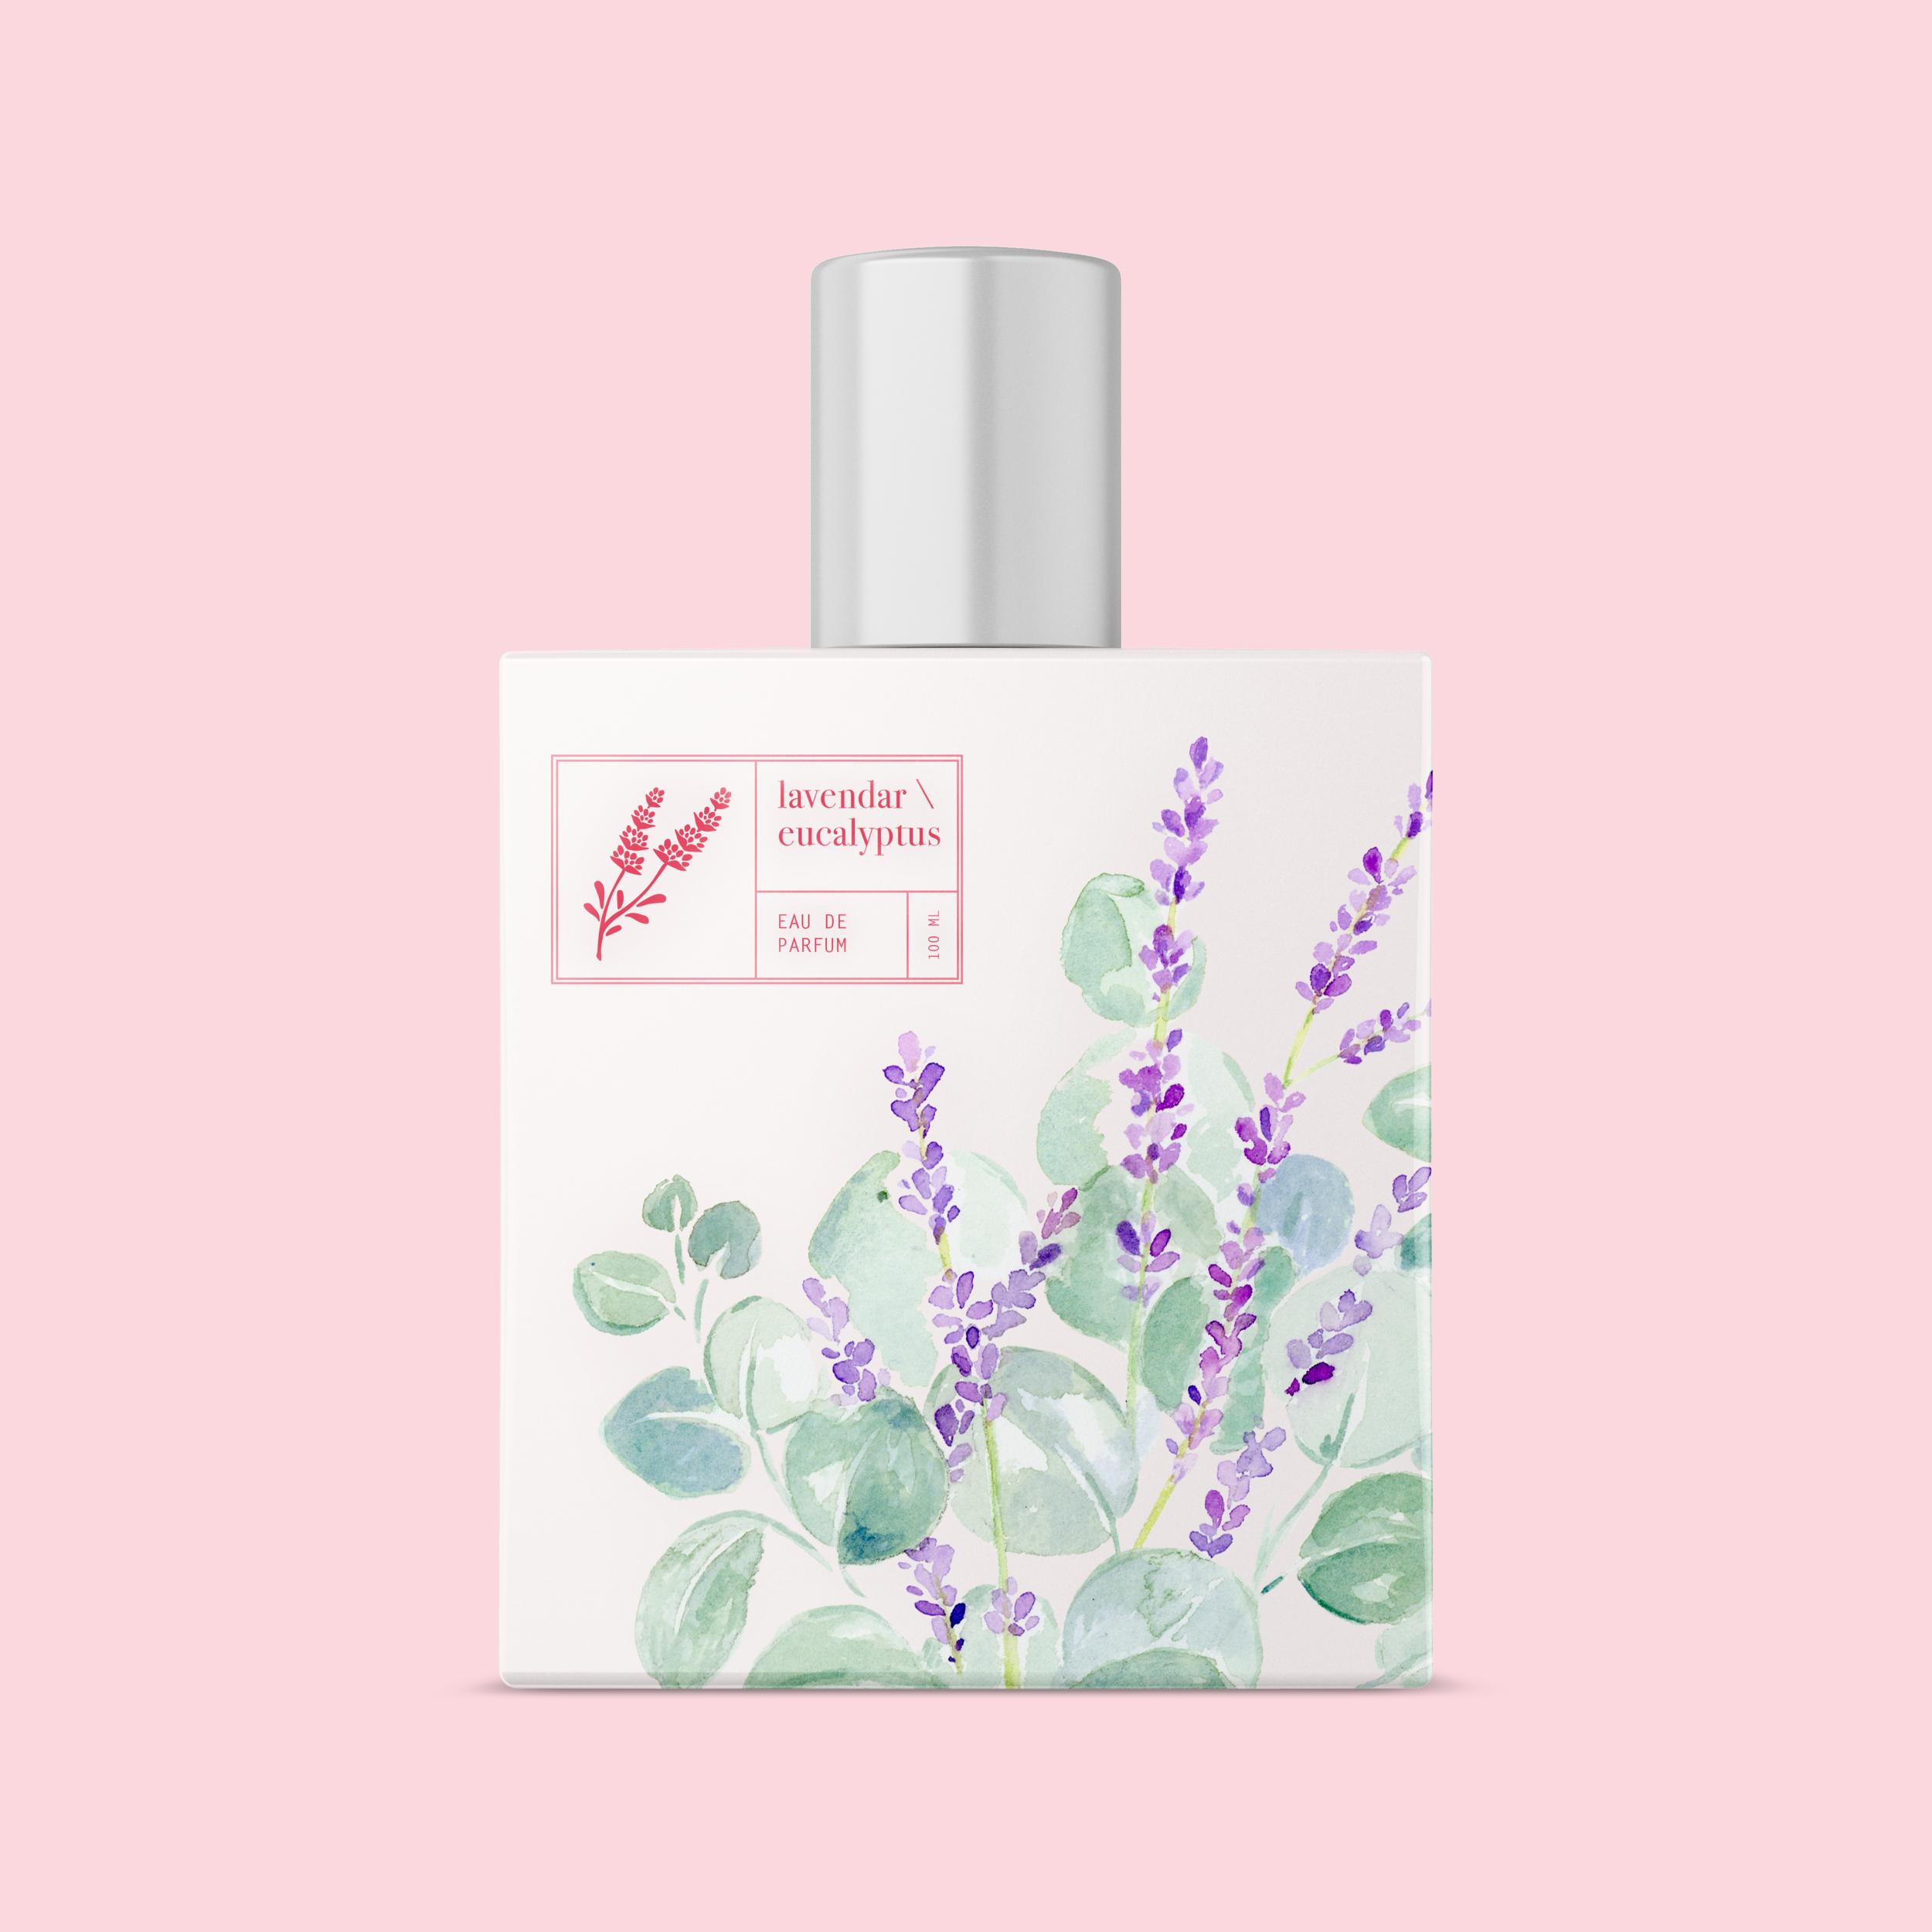 lavendar-perfume-2.jpg